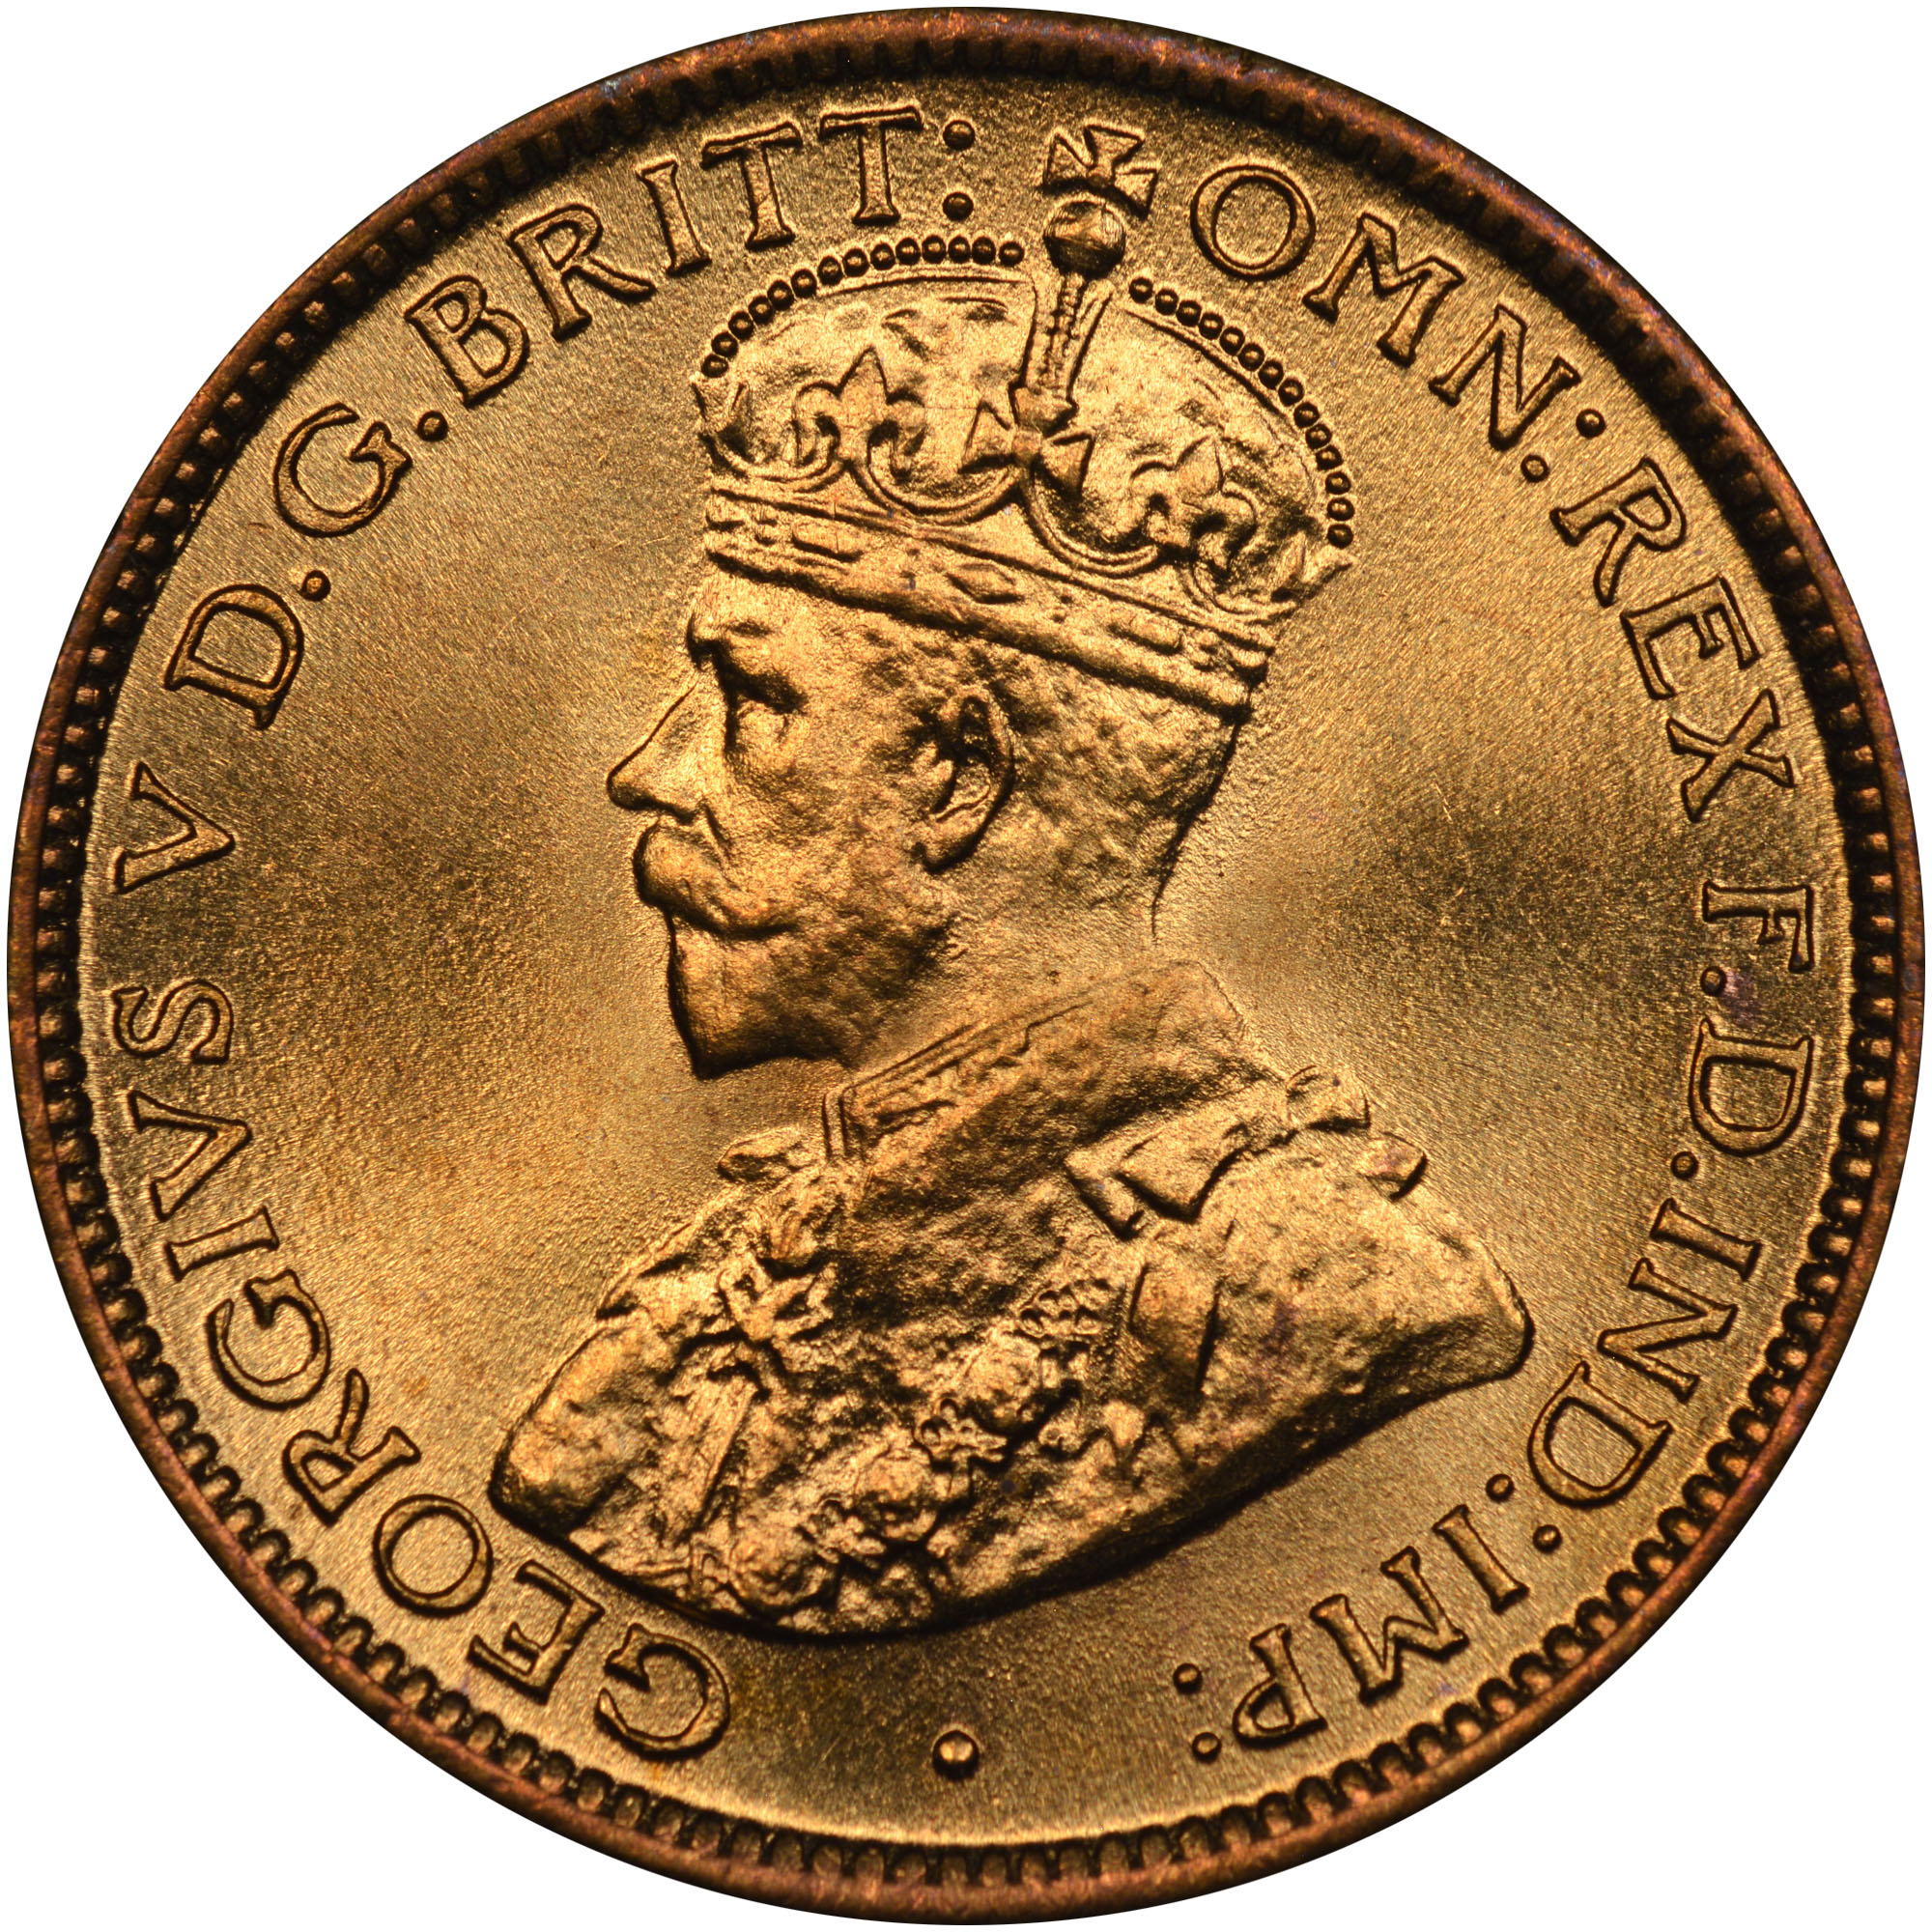 British West Africa 6 Pence obverse